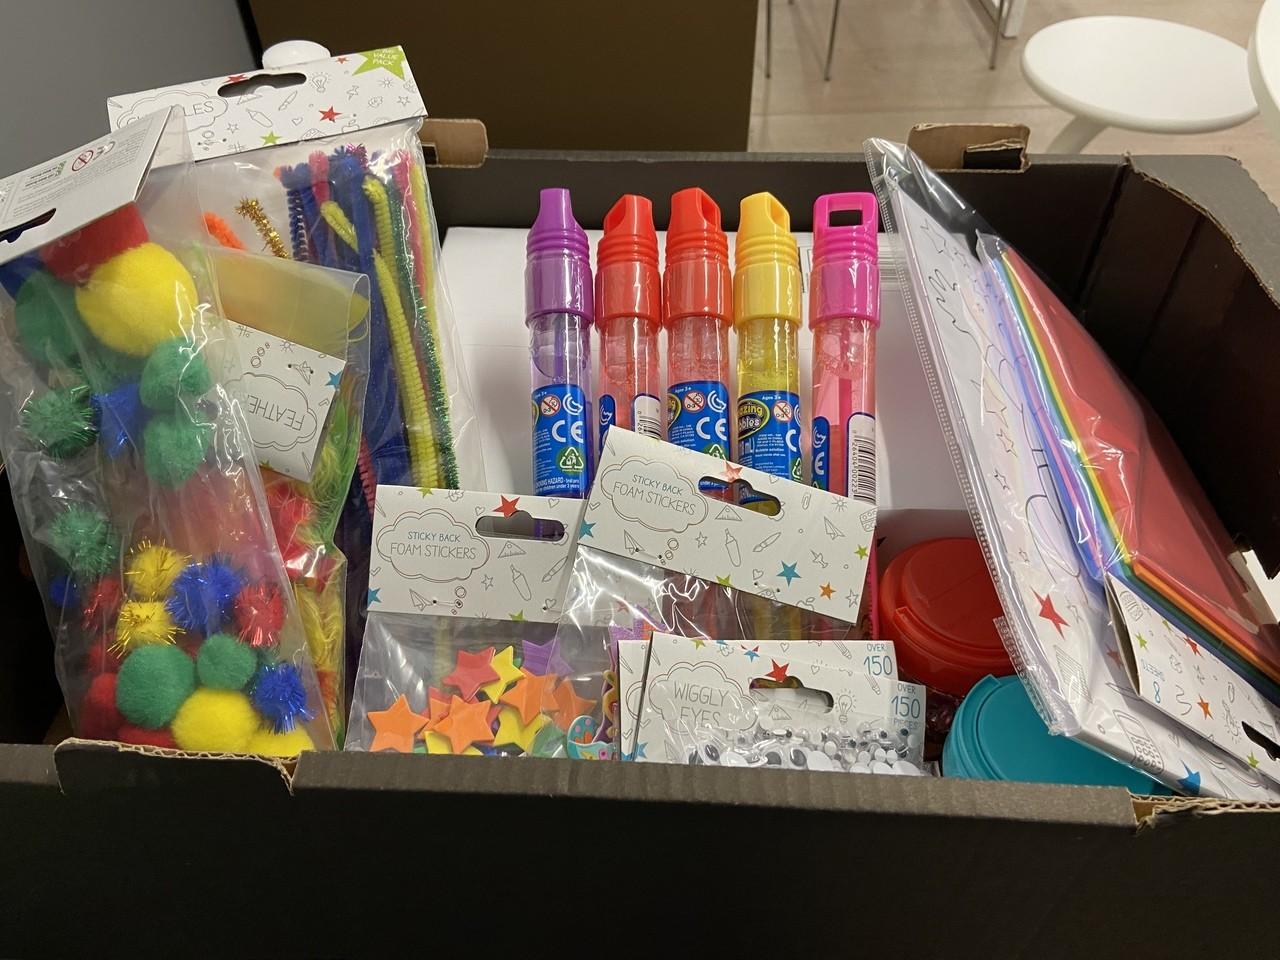 Asda Biggleswade donations to local Schools. | Asda Biggleswade